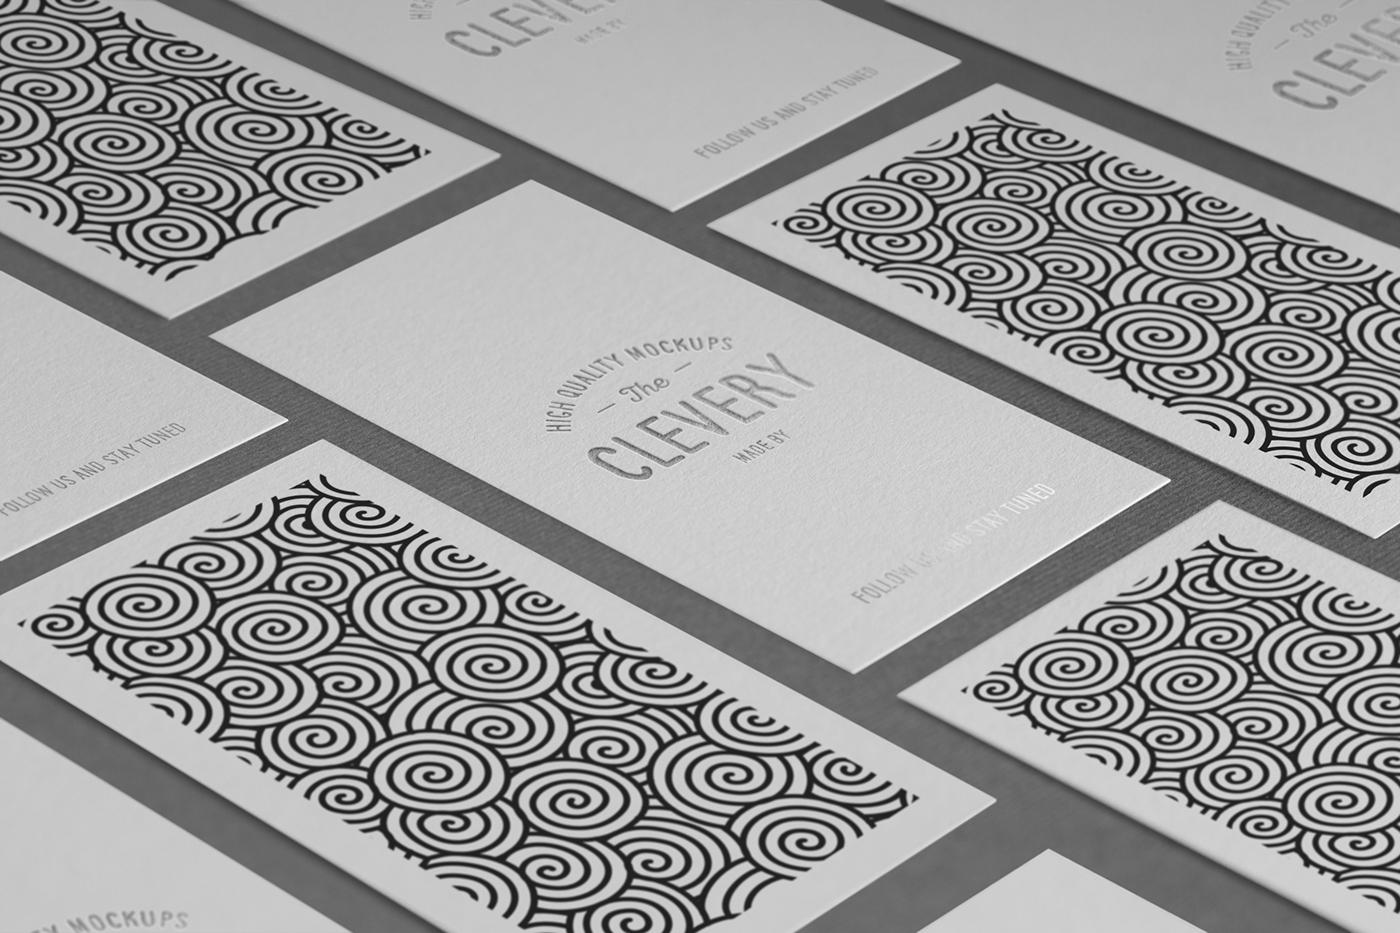 Photorealistic business card mock up 20 on behance colourmoves